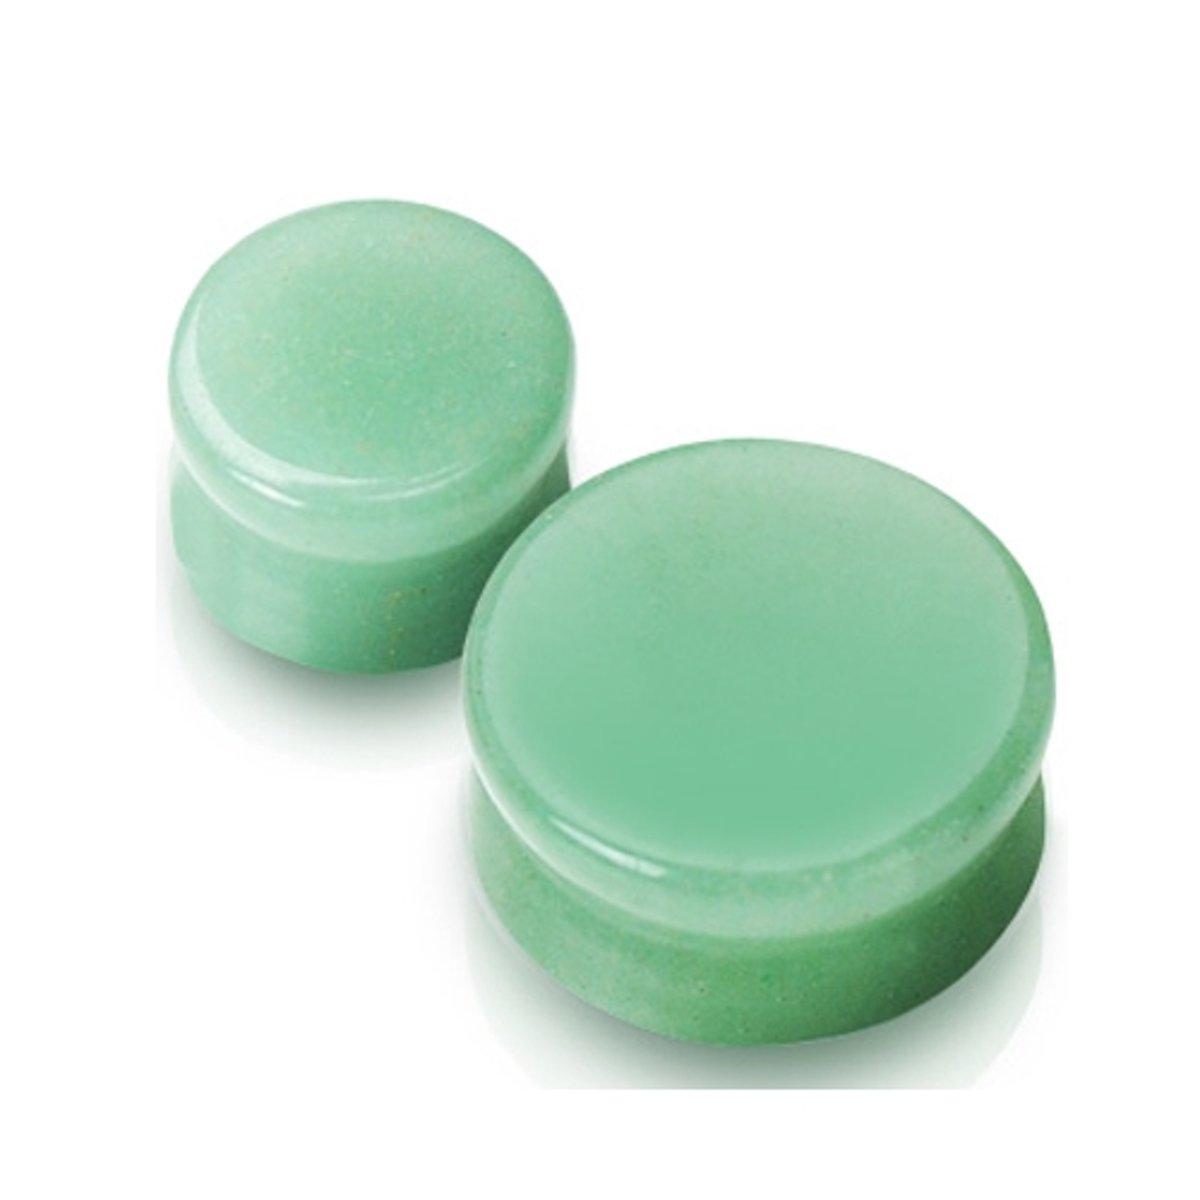 8 mm Double-flared plug Jade steen groen ©LMPiercings kopen